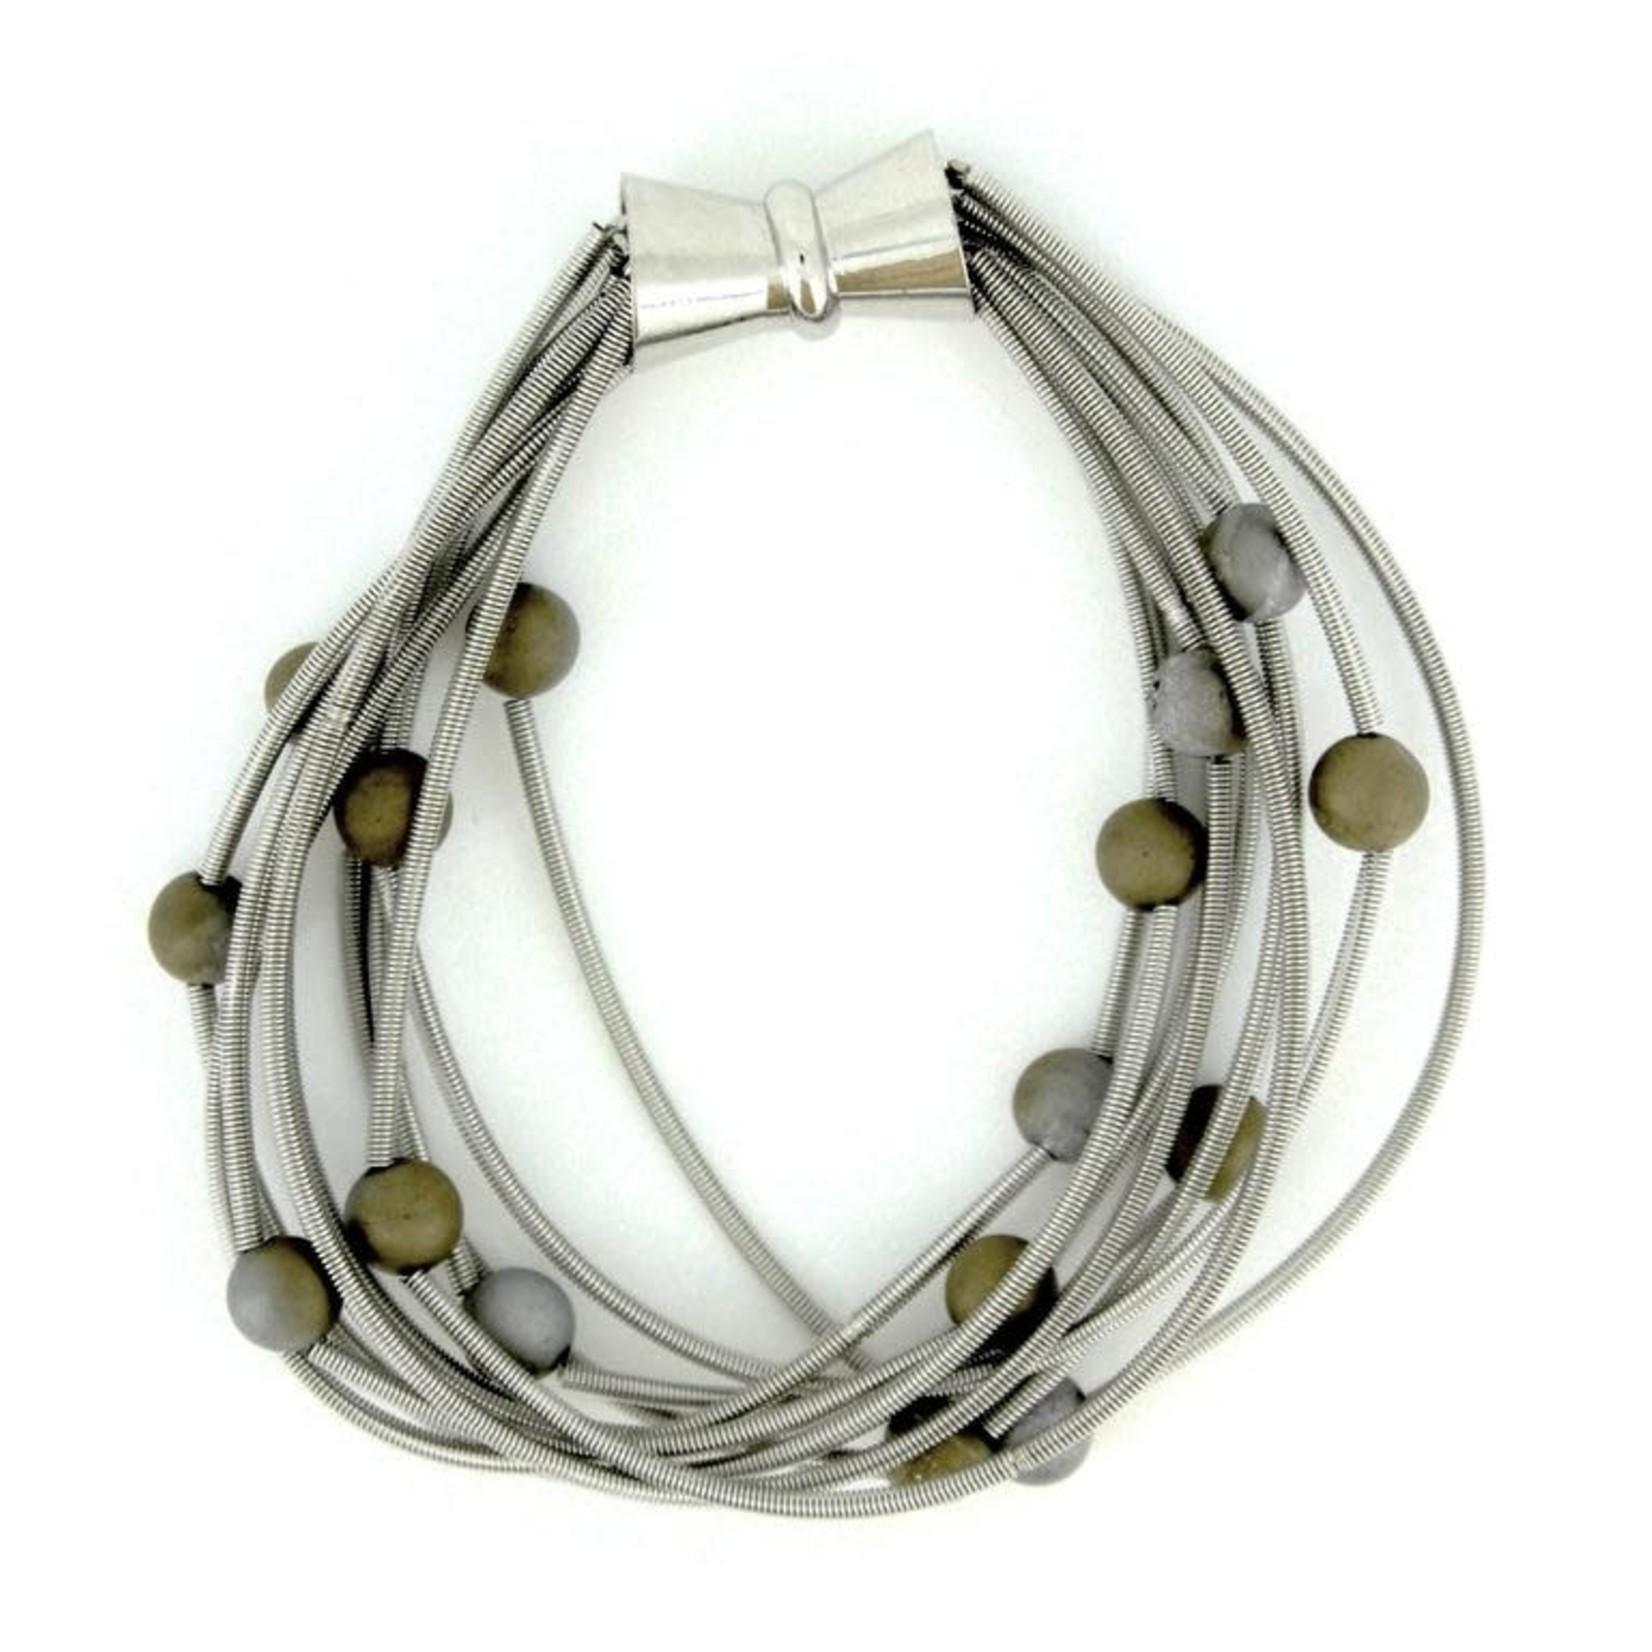 Sea Lily 10 Layer Silver Bracelet w/ Silver/Gold Geodes